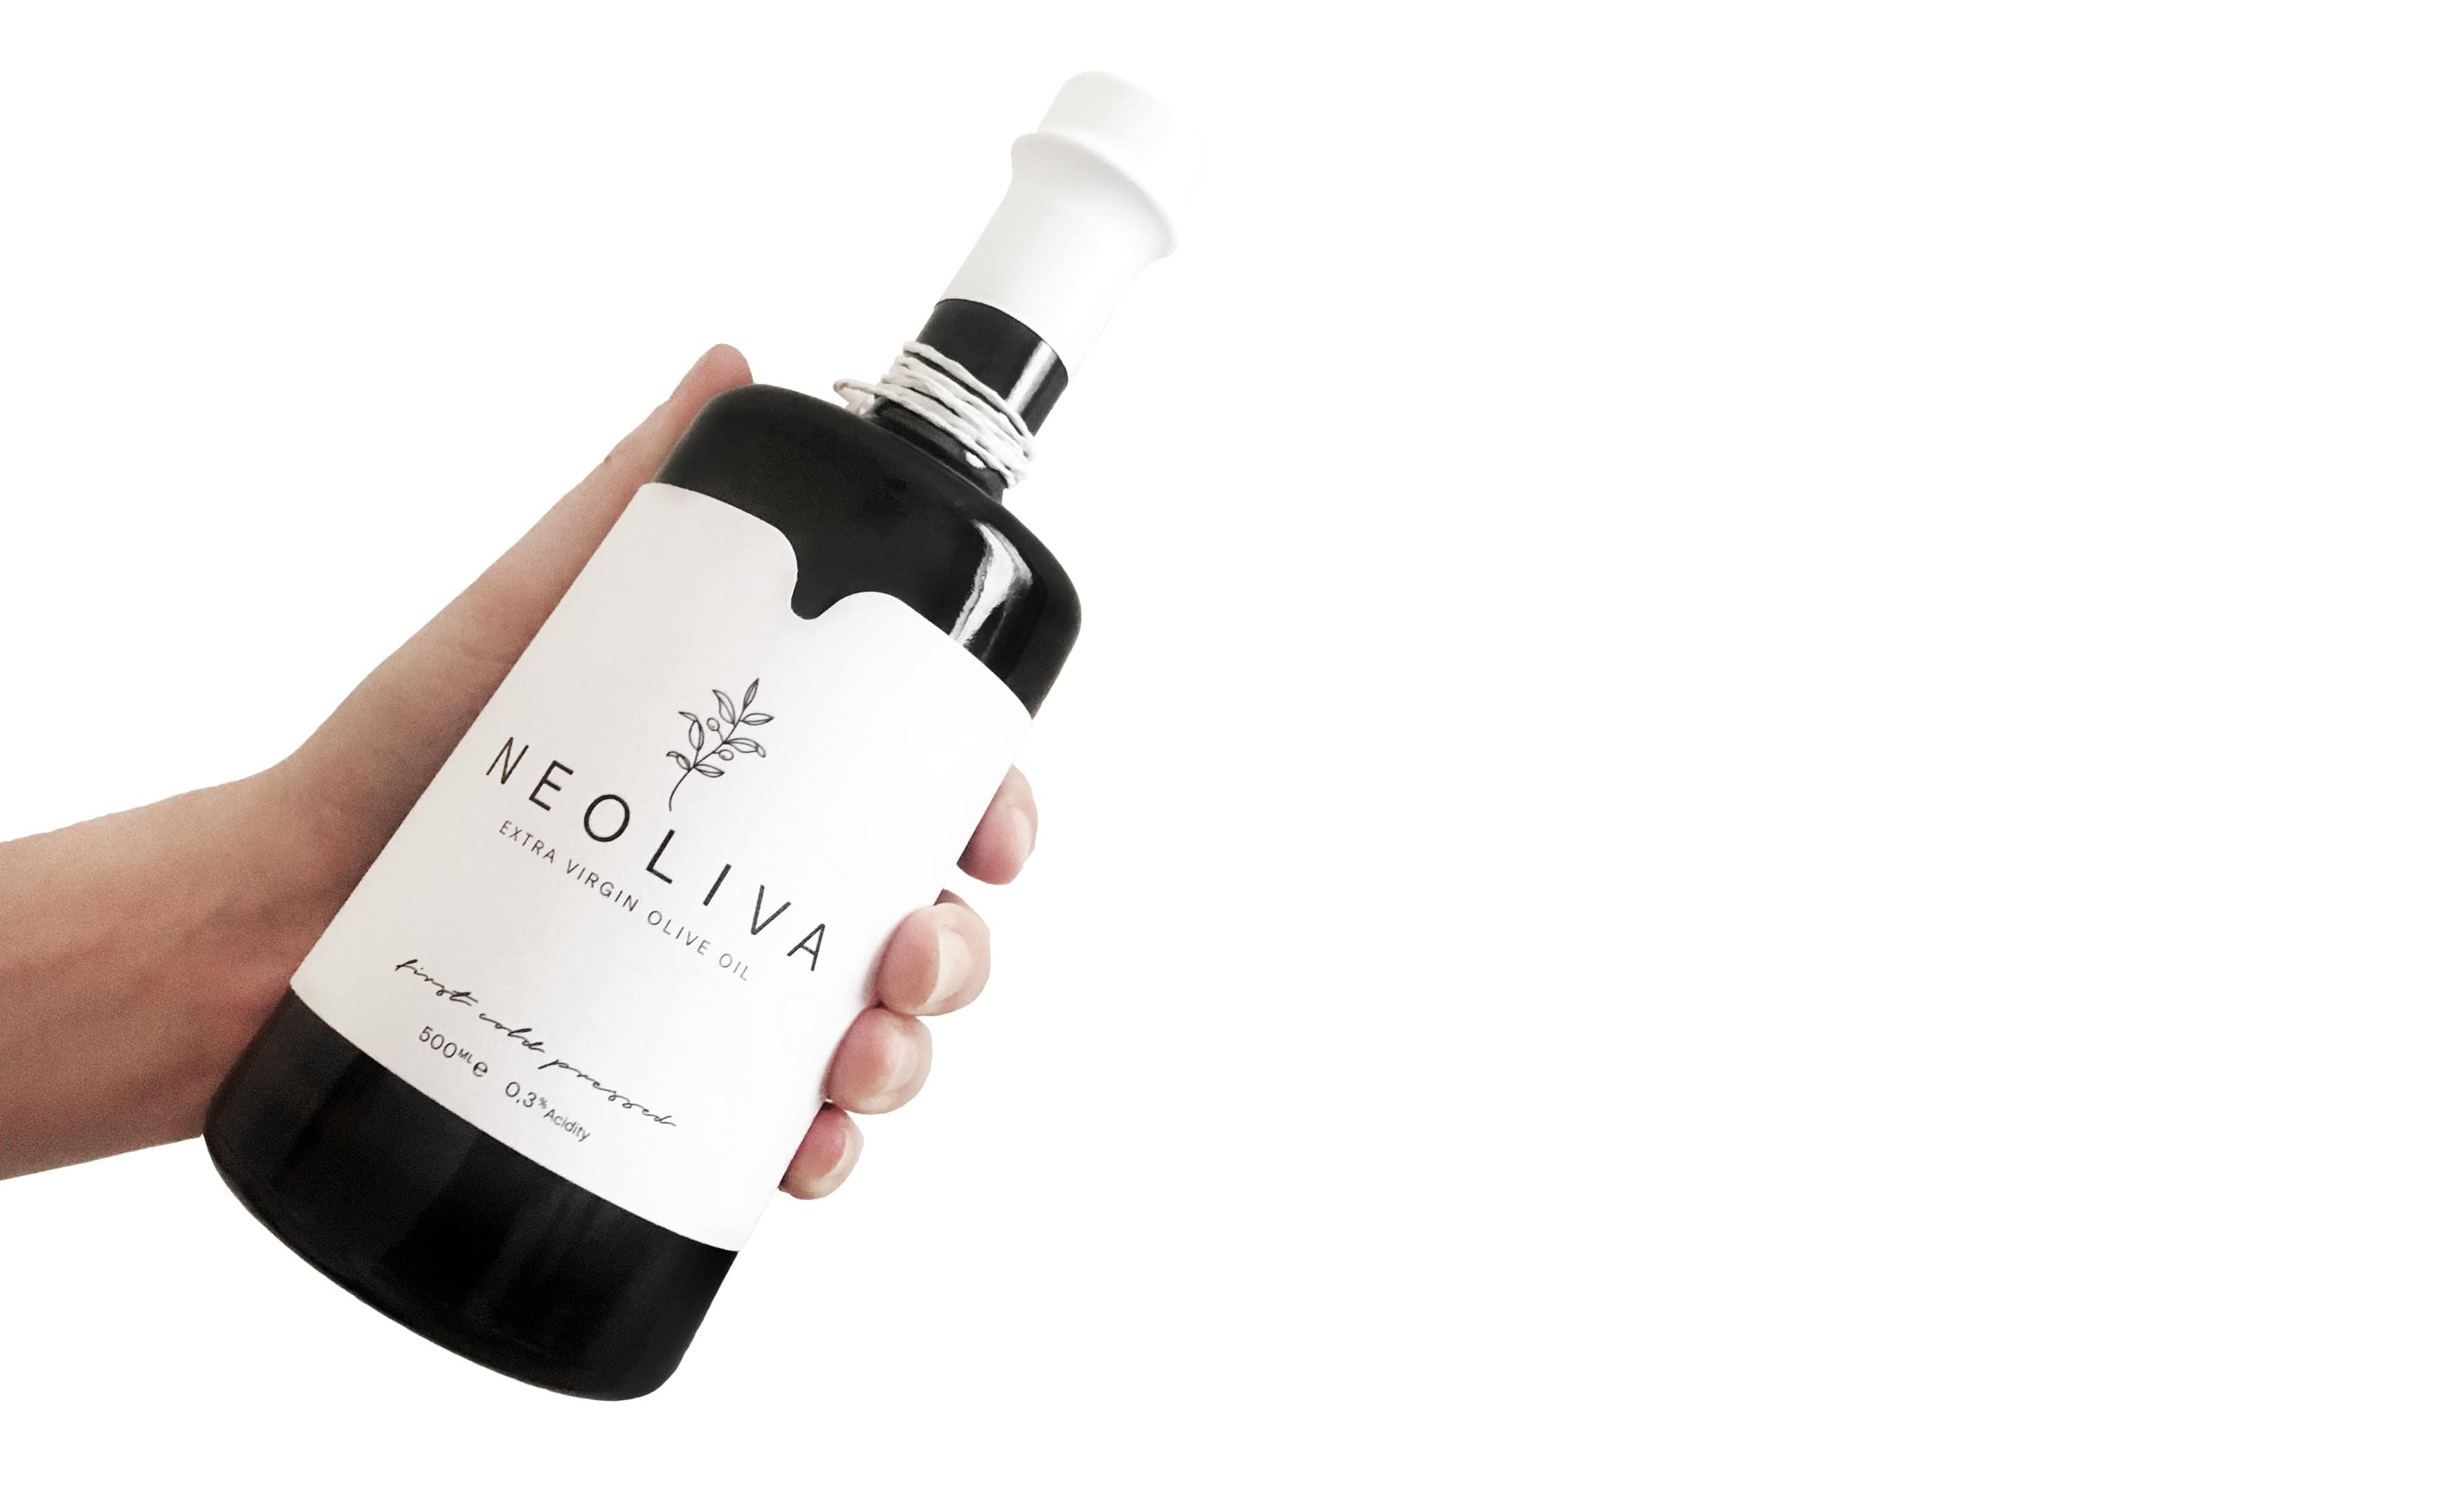 Neoliva-Gokten-Tut-Website-13